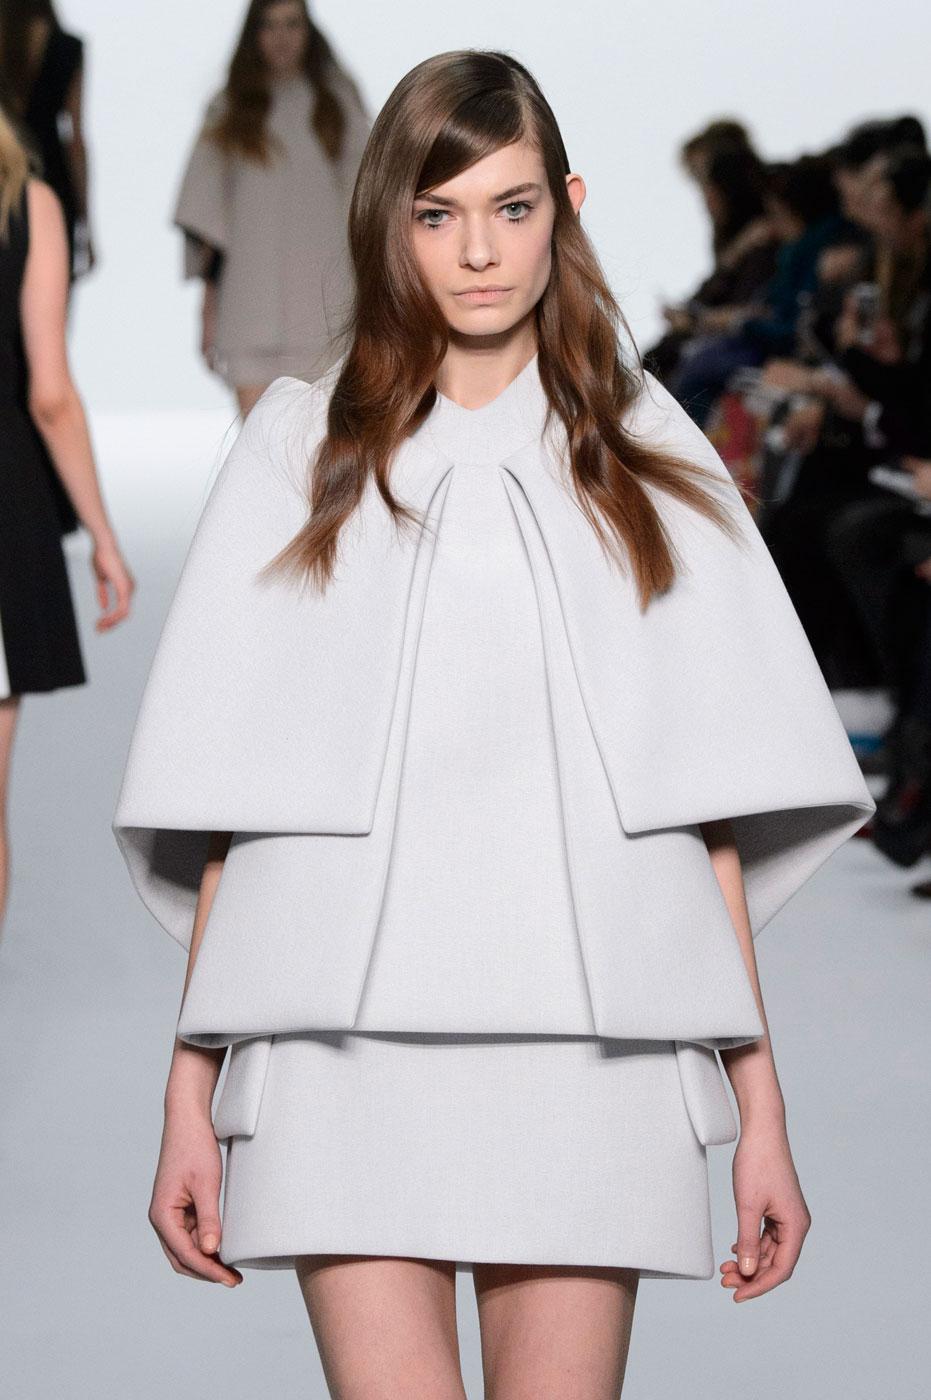 Kayek-fashion-runway-show-haute-couture-paris-spring-summer-2015-the-impression-18